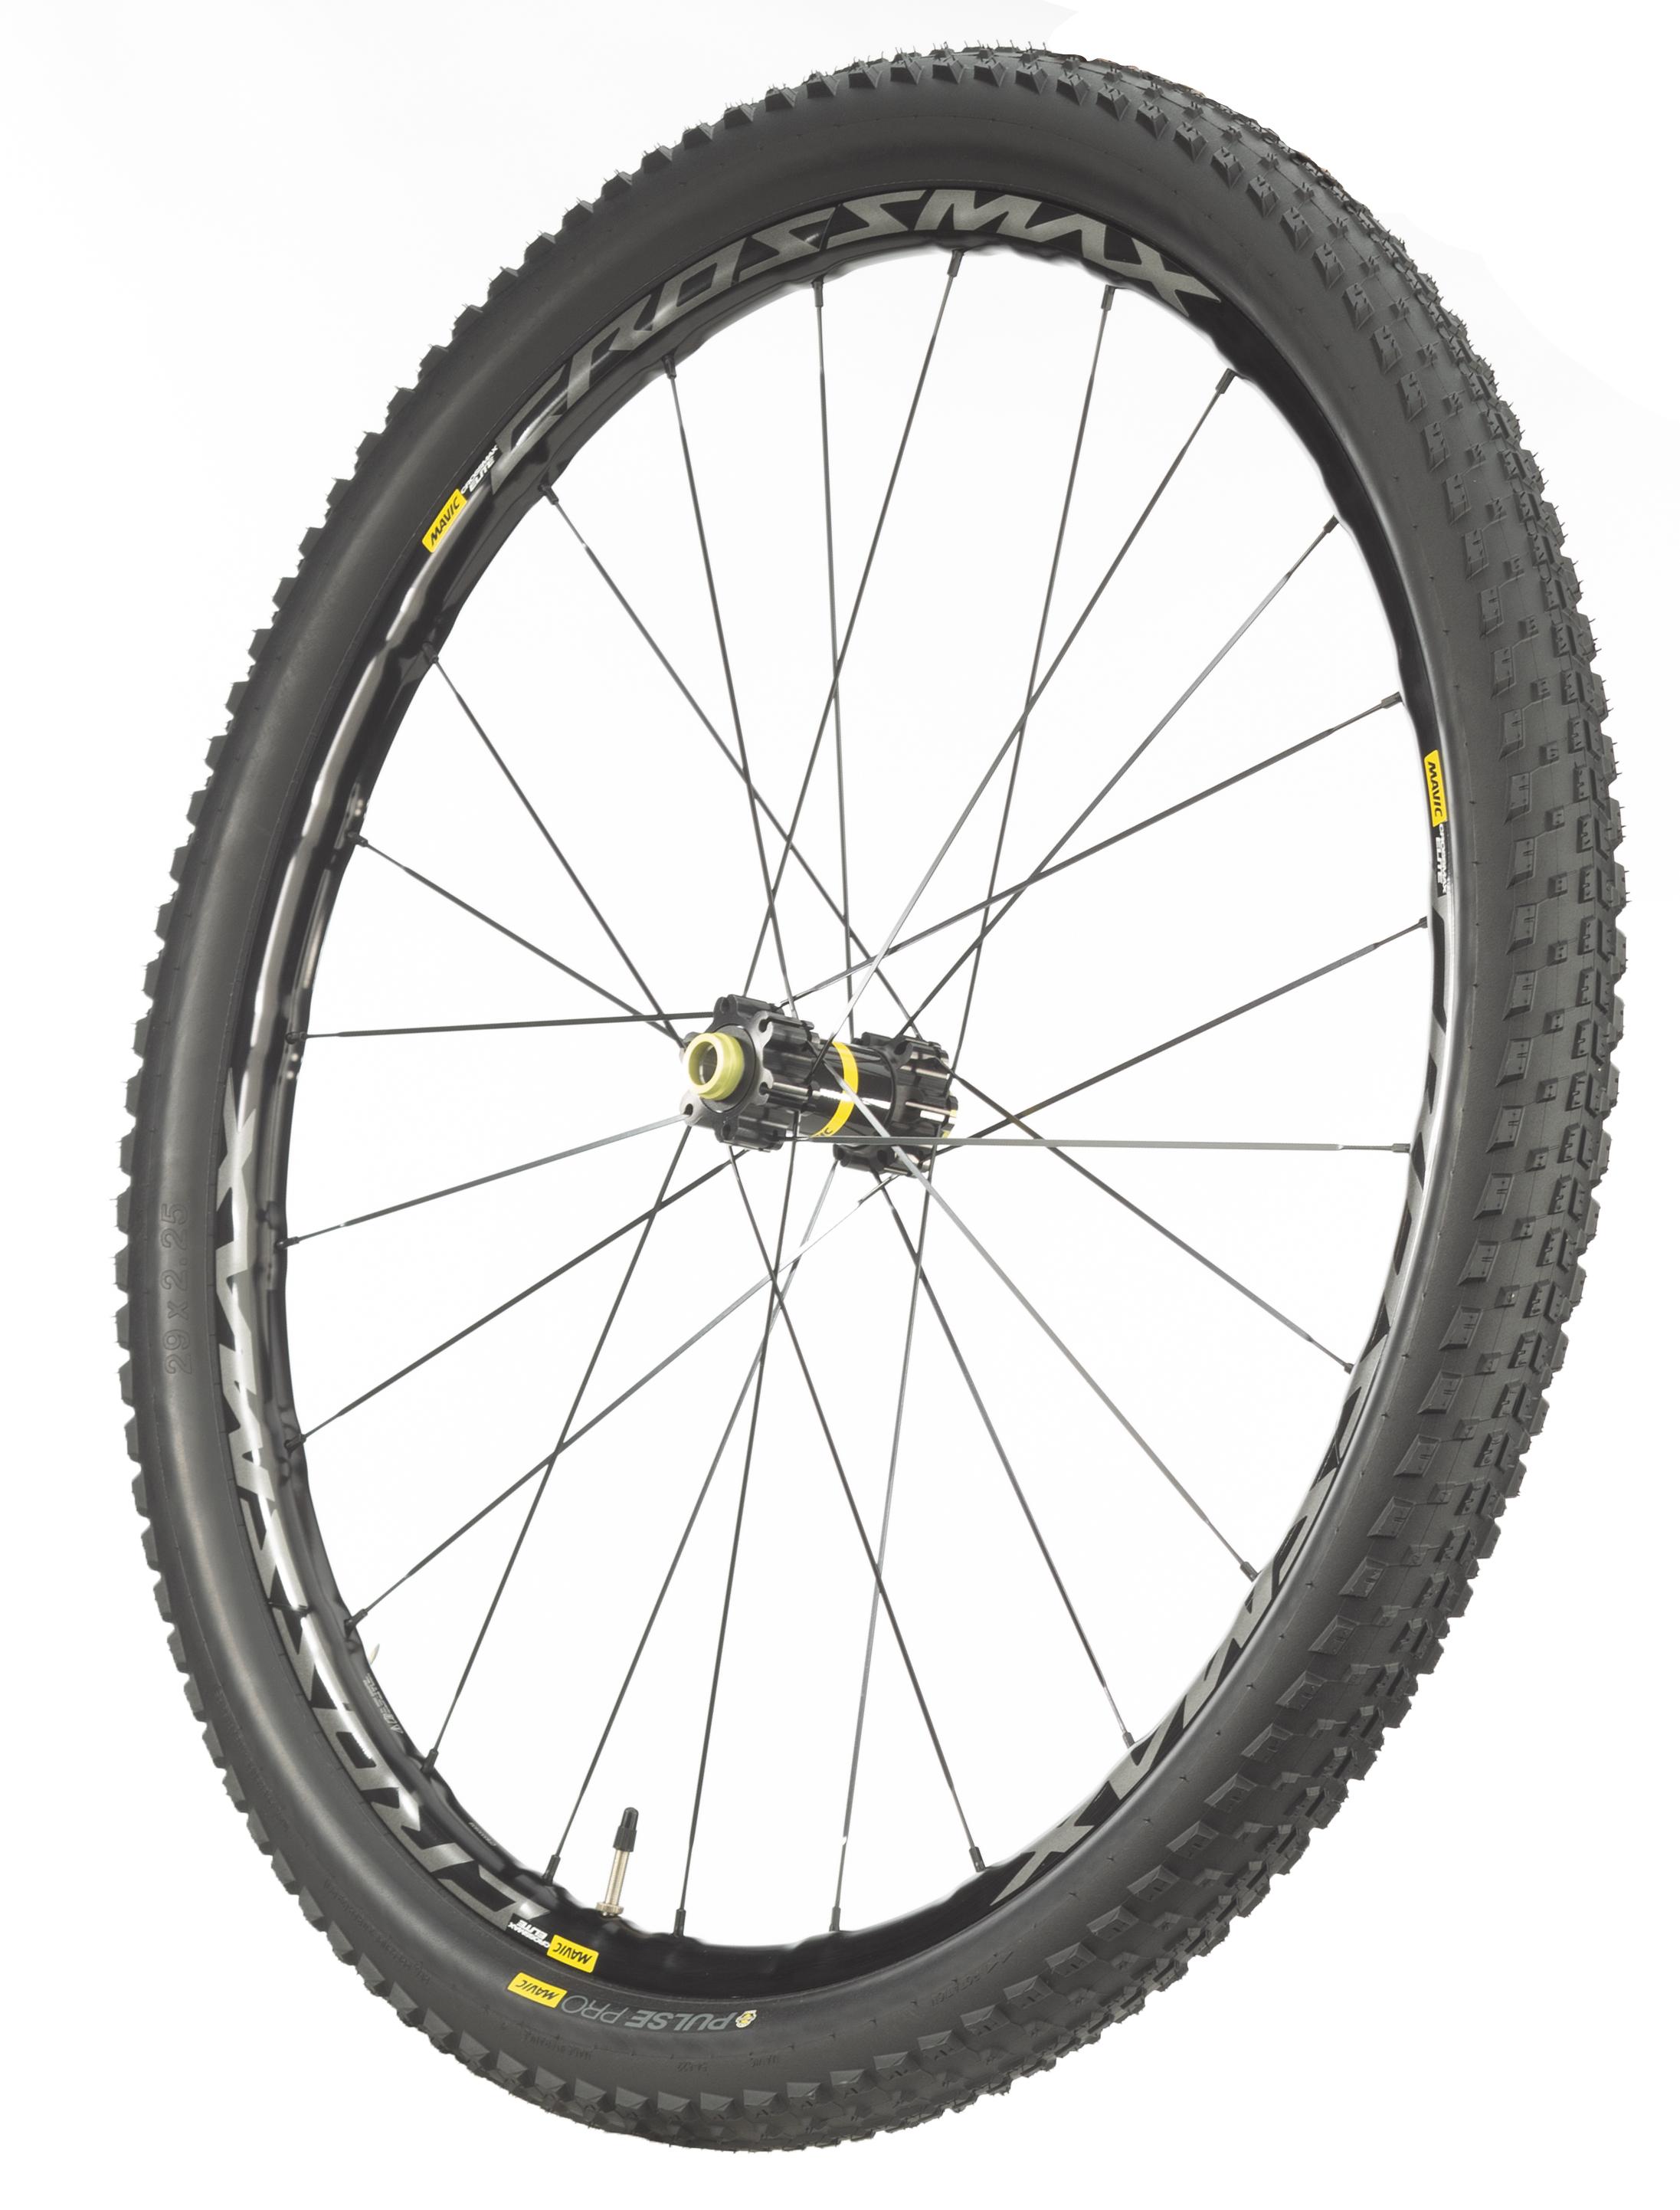 Mavic Crossmax Elite 29 Boost Wheel